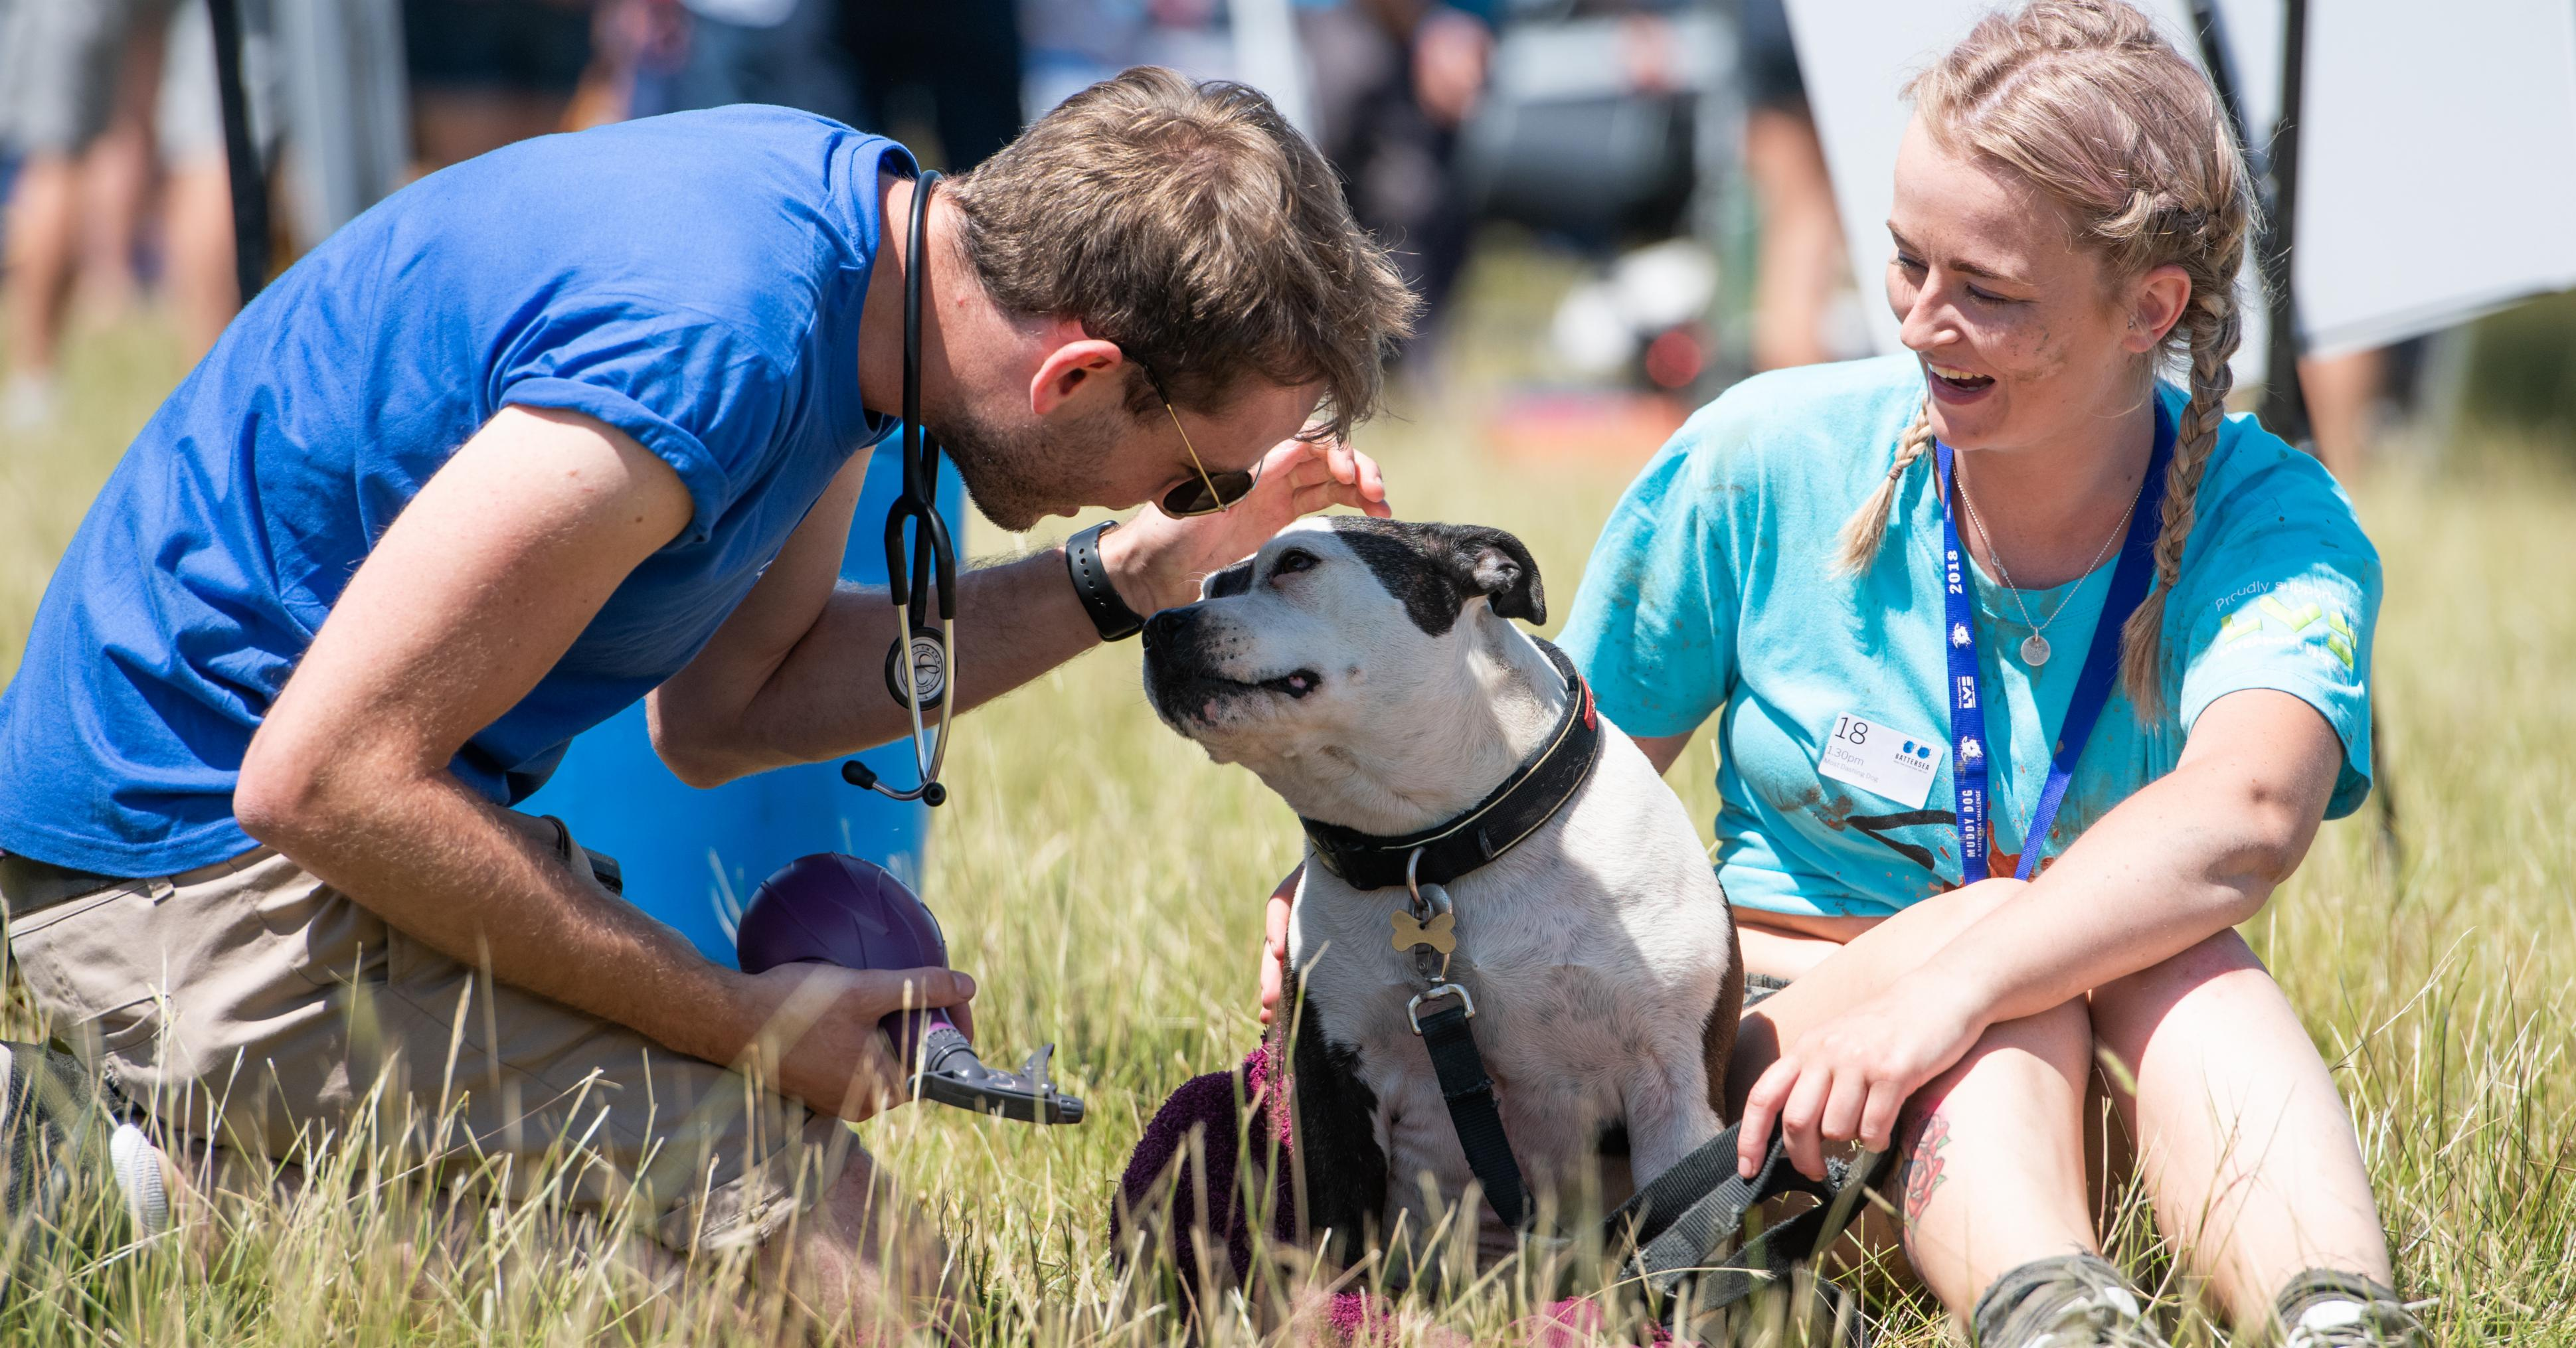 Battersea dog event official image